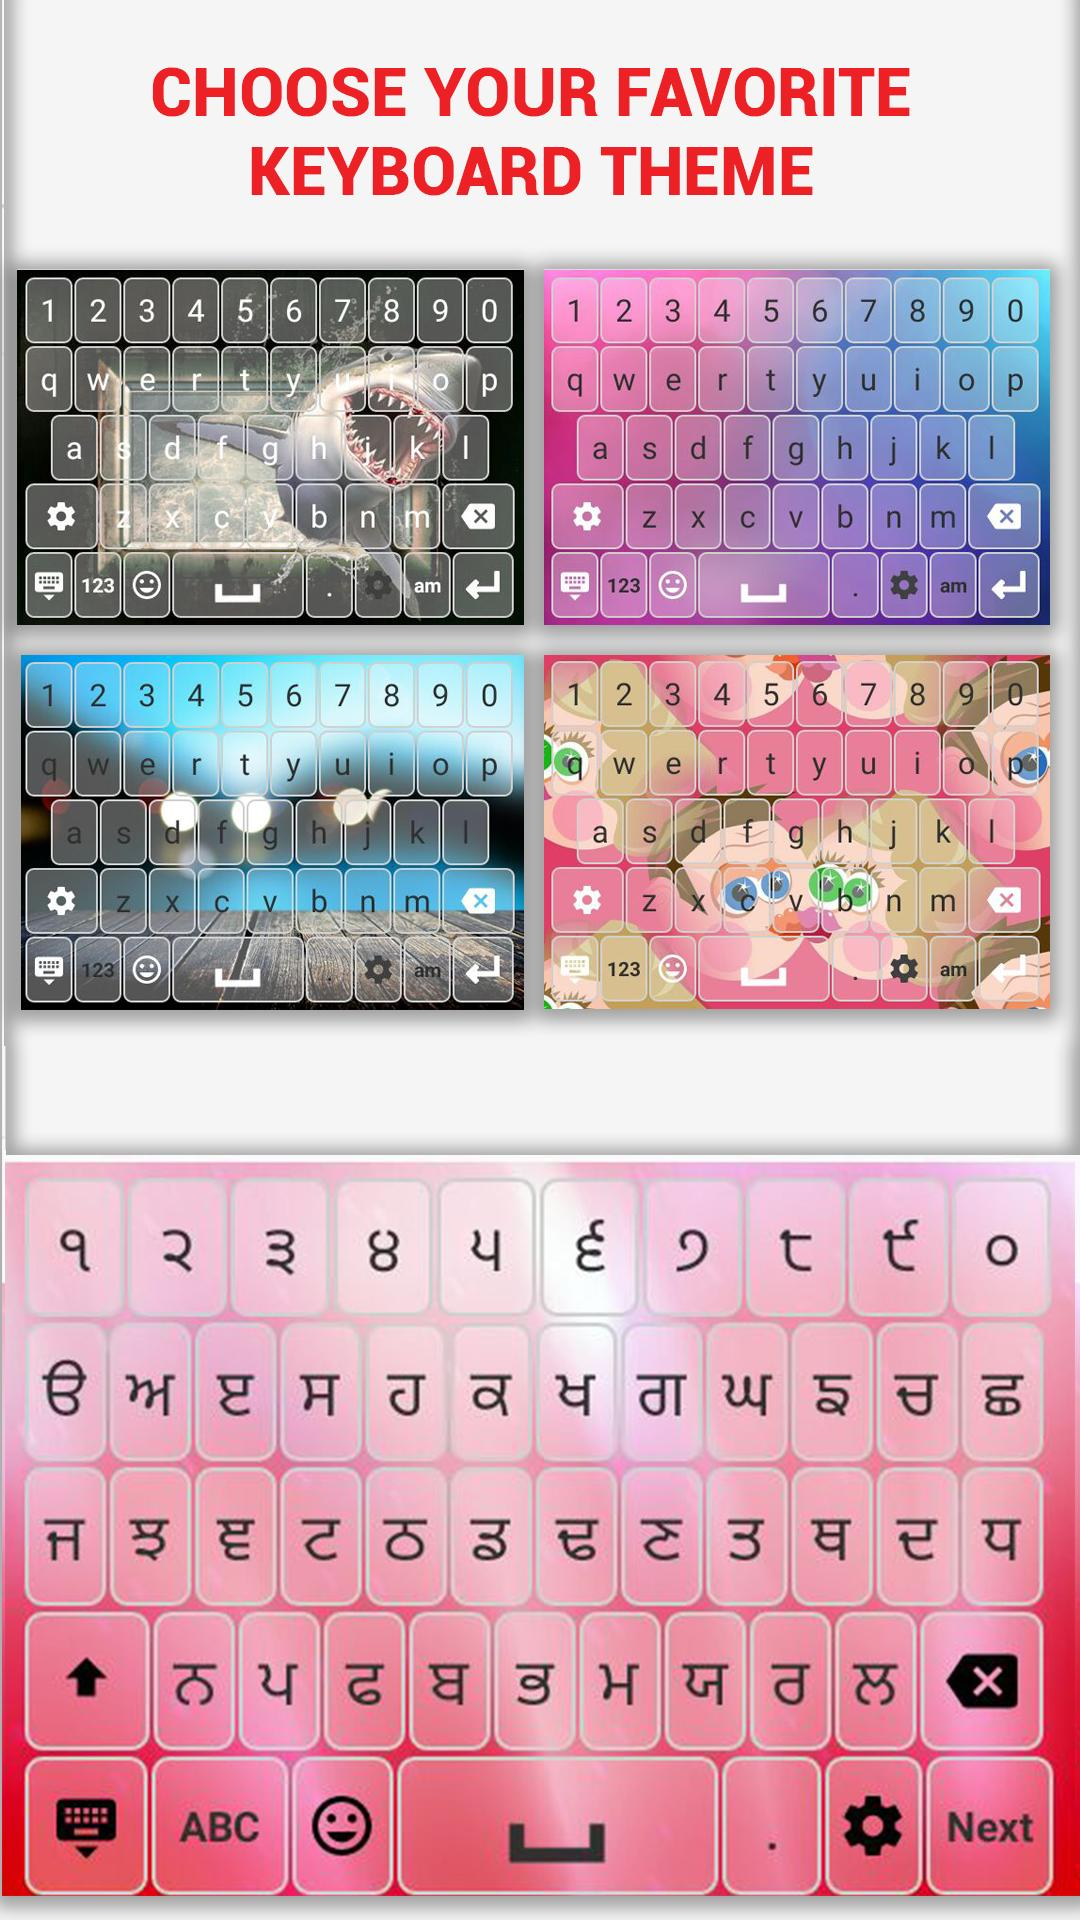 Punjabi Keyboard for Android - APK Download